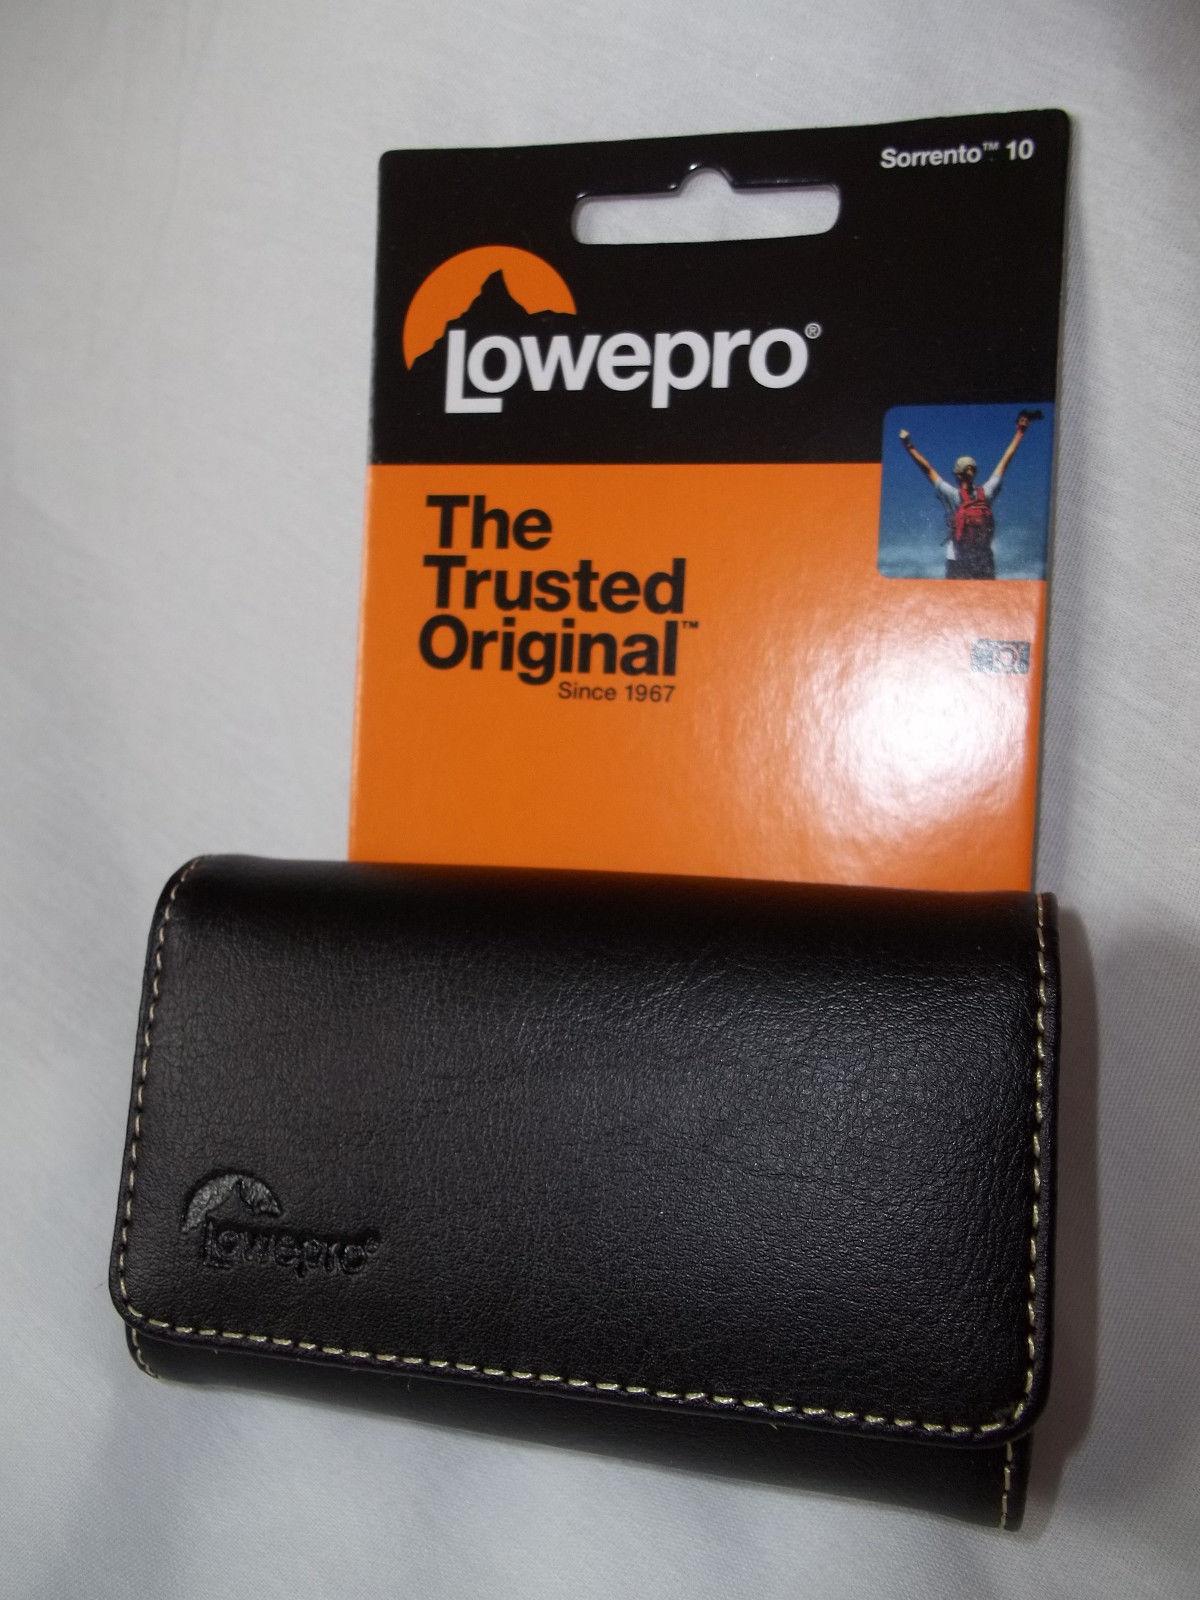 Camera Case Loewpro Leather Small Camera Case Sorrento 10